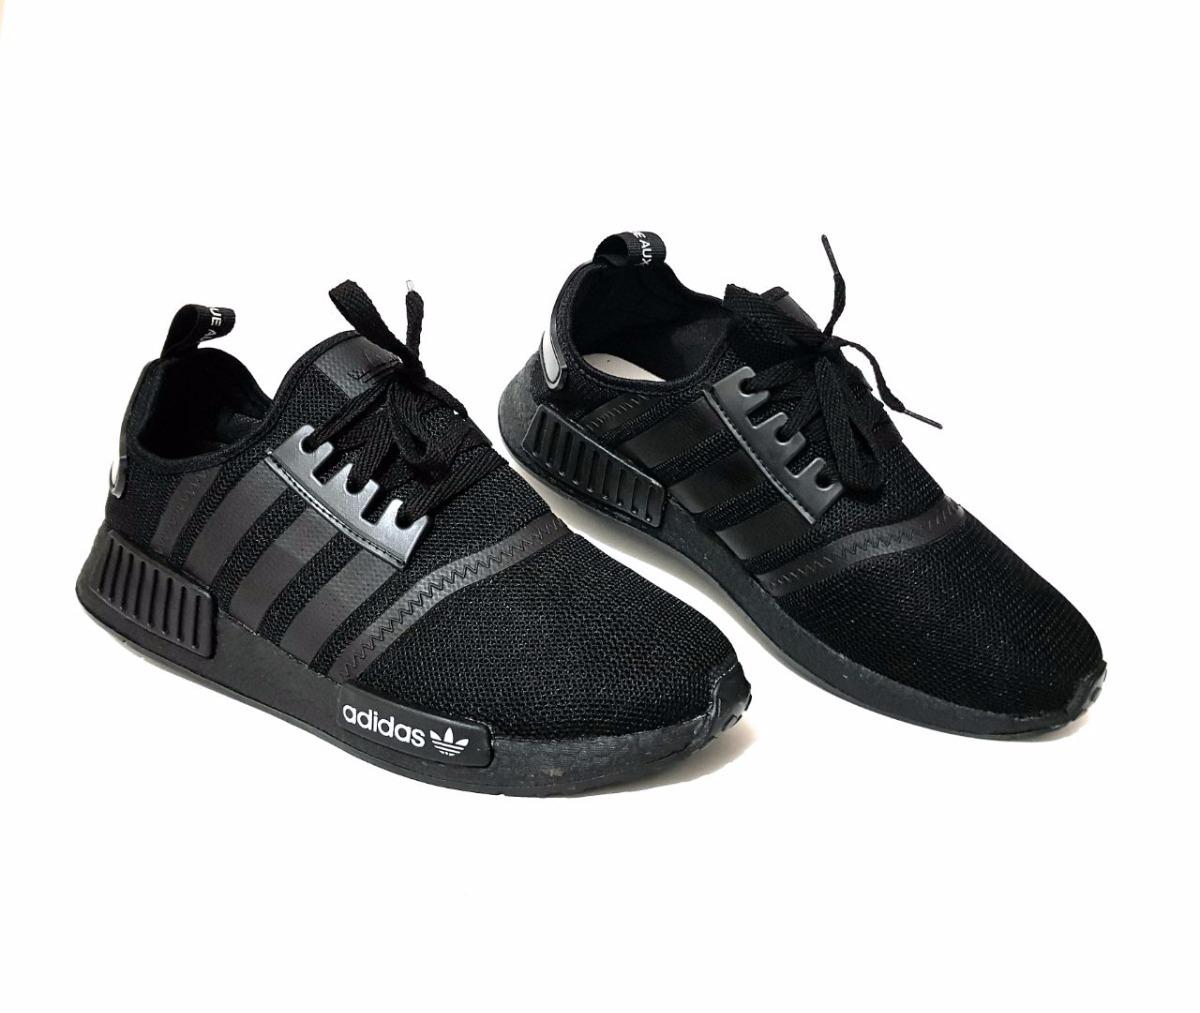 Tênis adidas Nmd Runner Boost Masculino 4 - LeveShoes 4726c9b3624c1